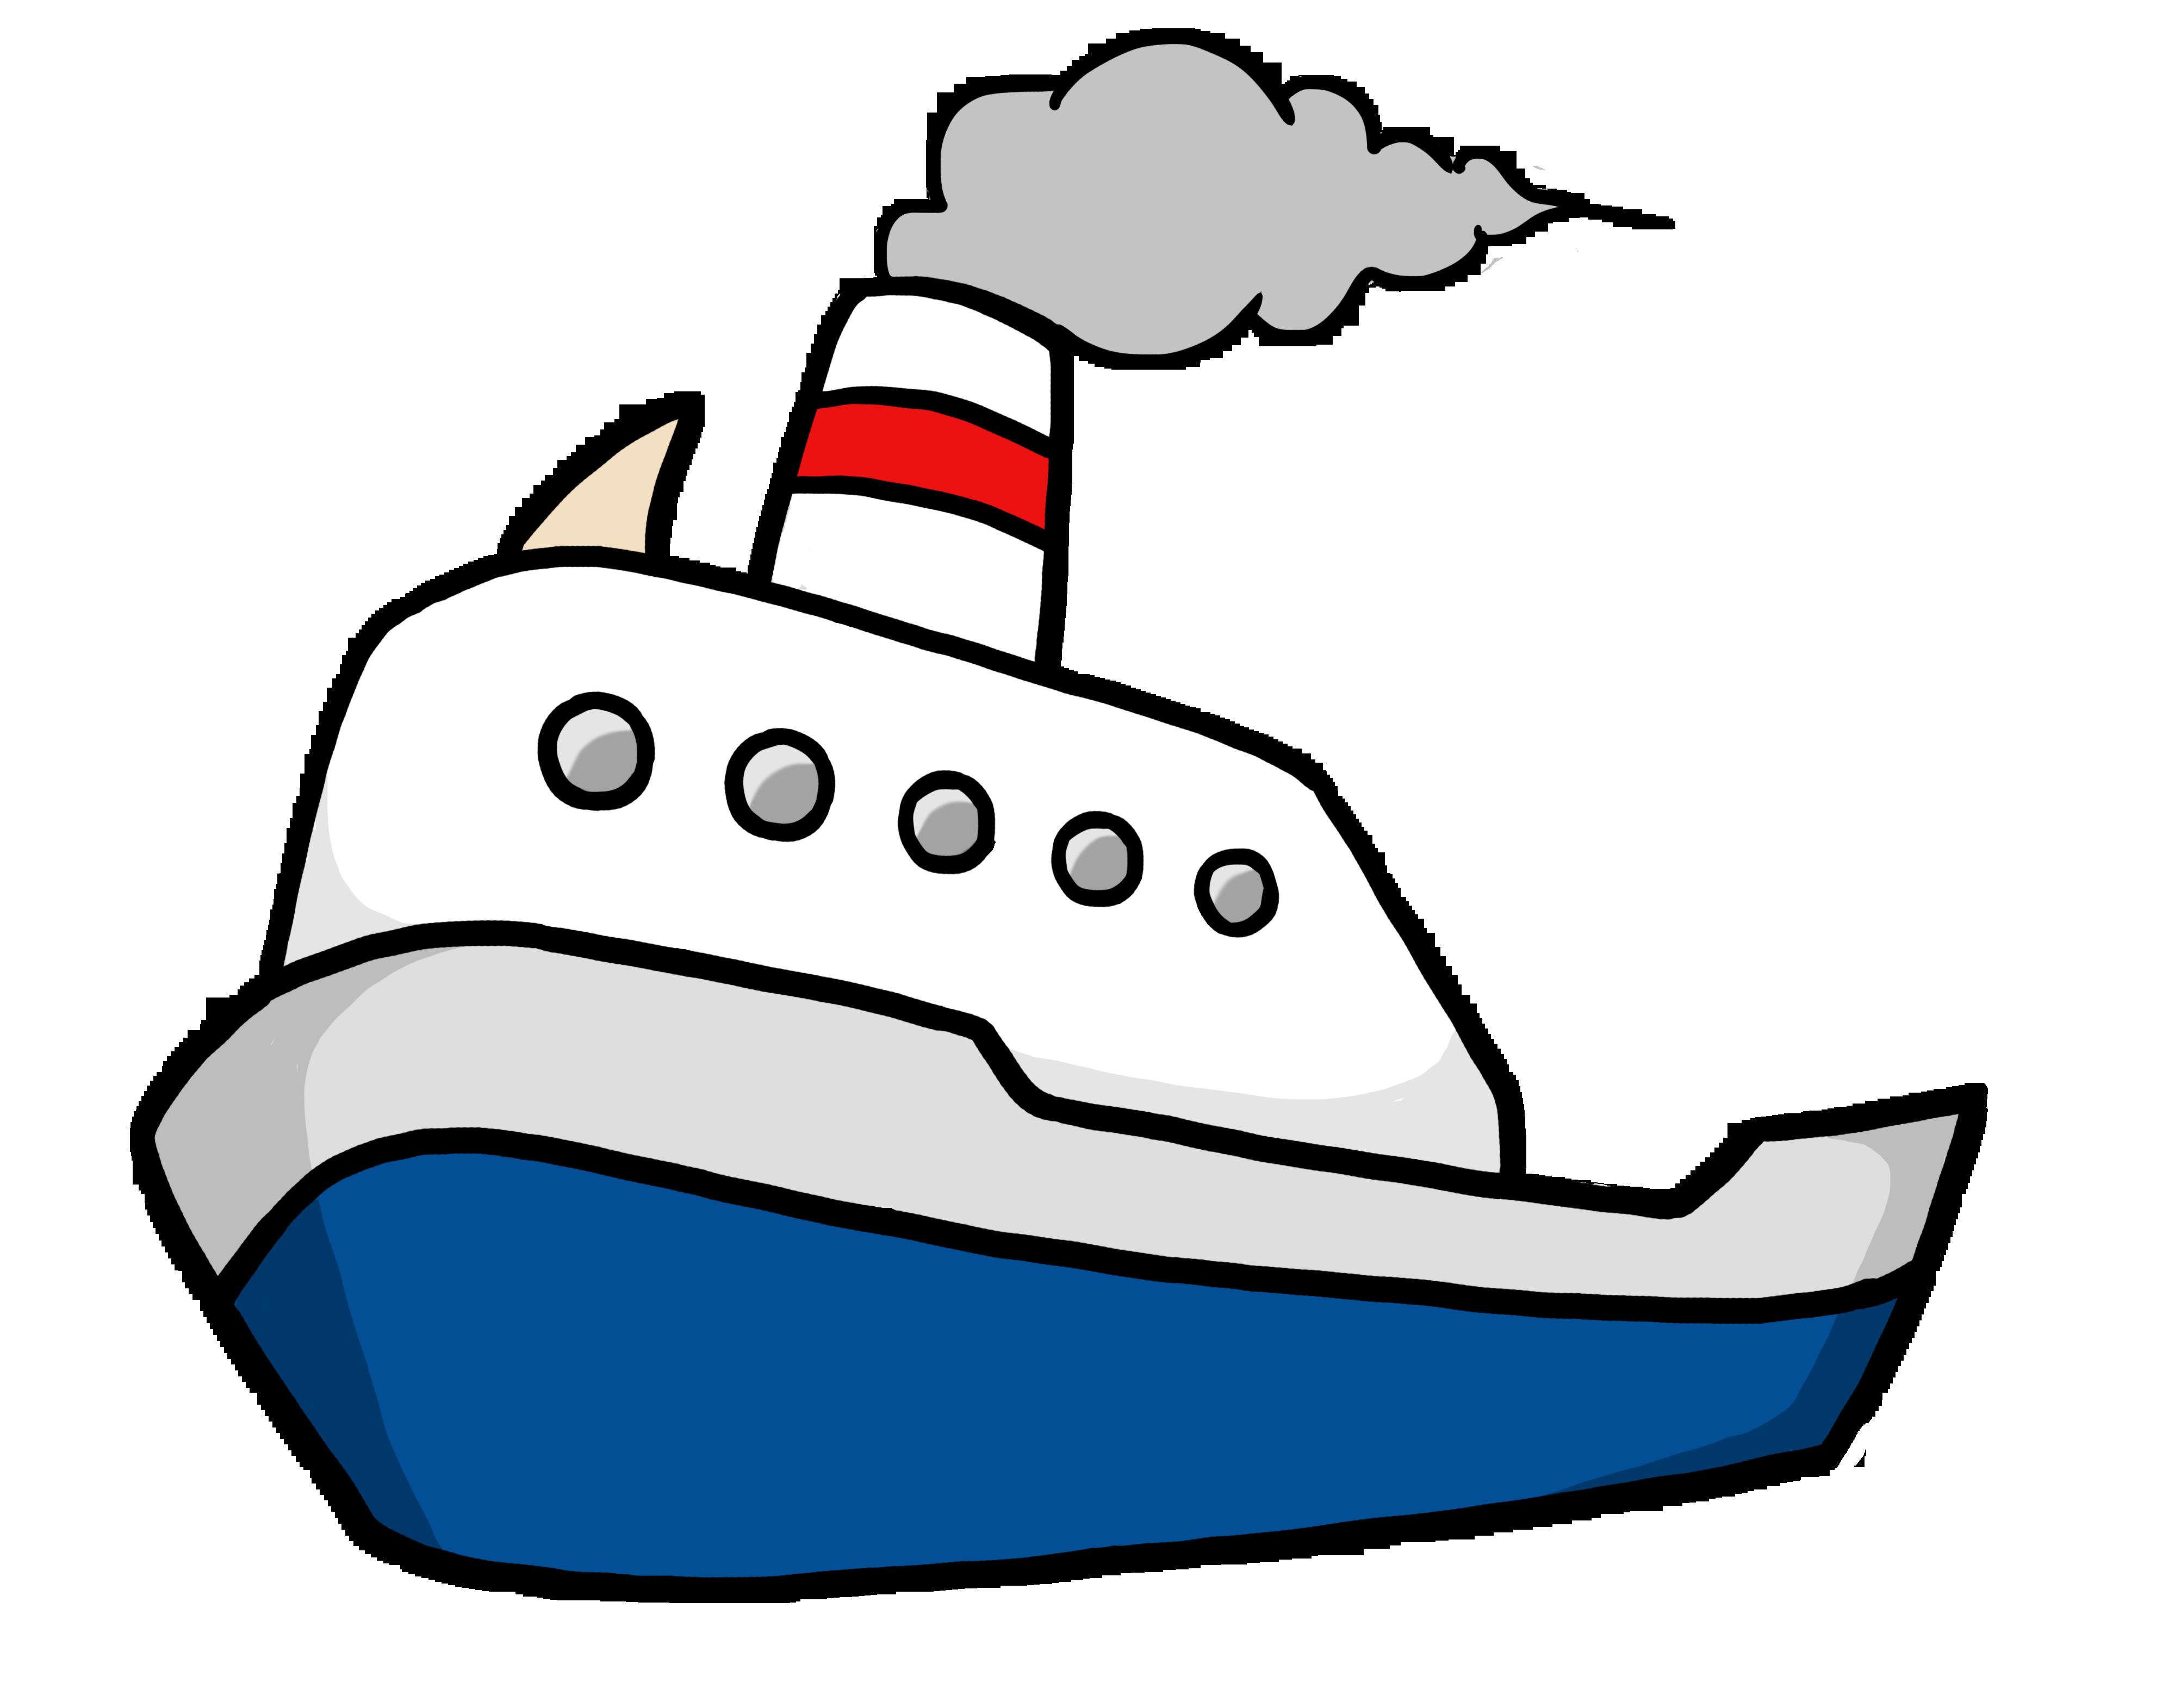 Row Boat Clipart Boat Clip Art | morze | Pinterest | Clip art